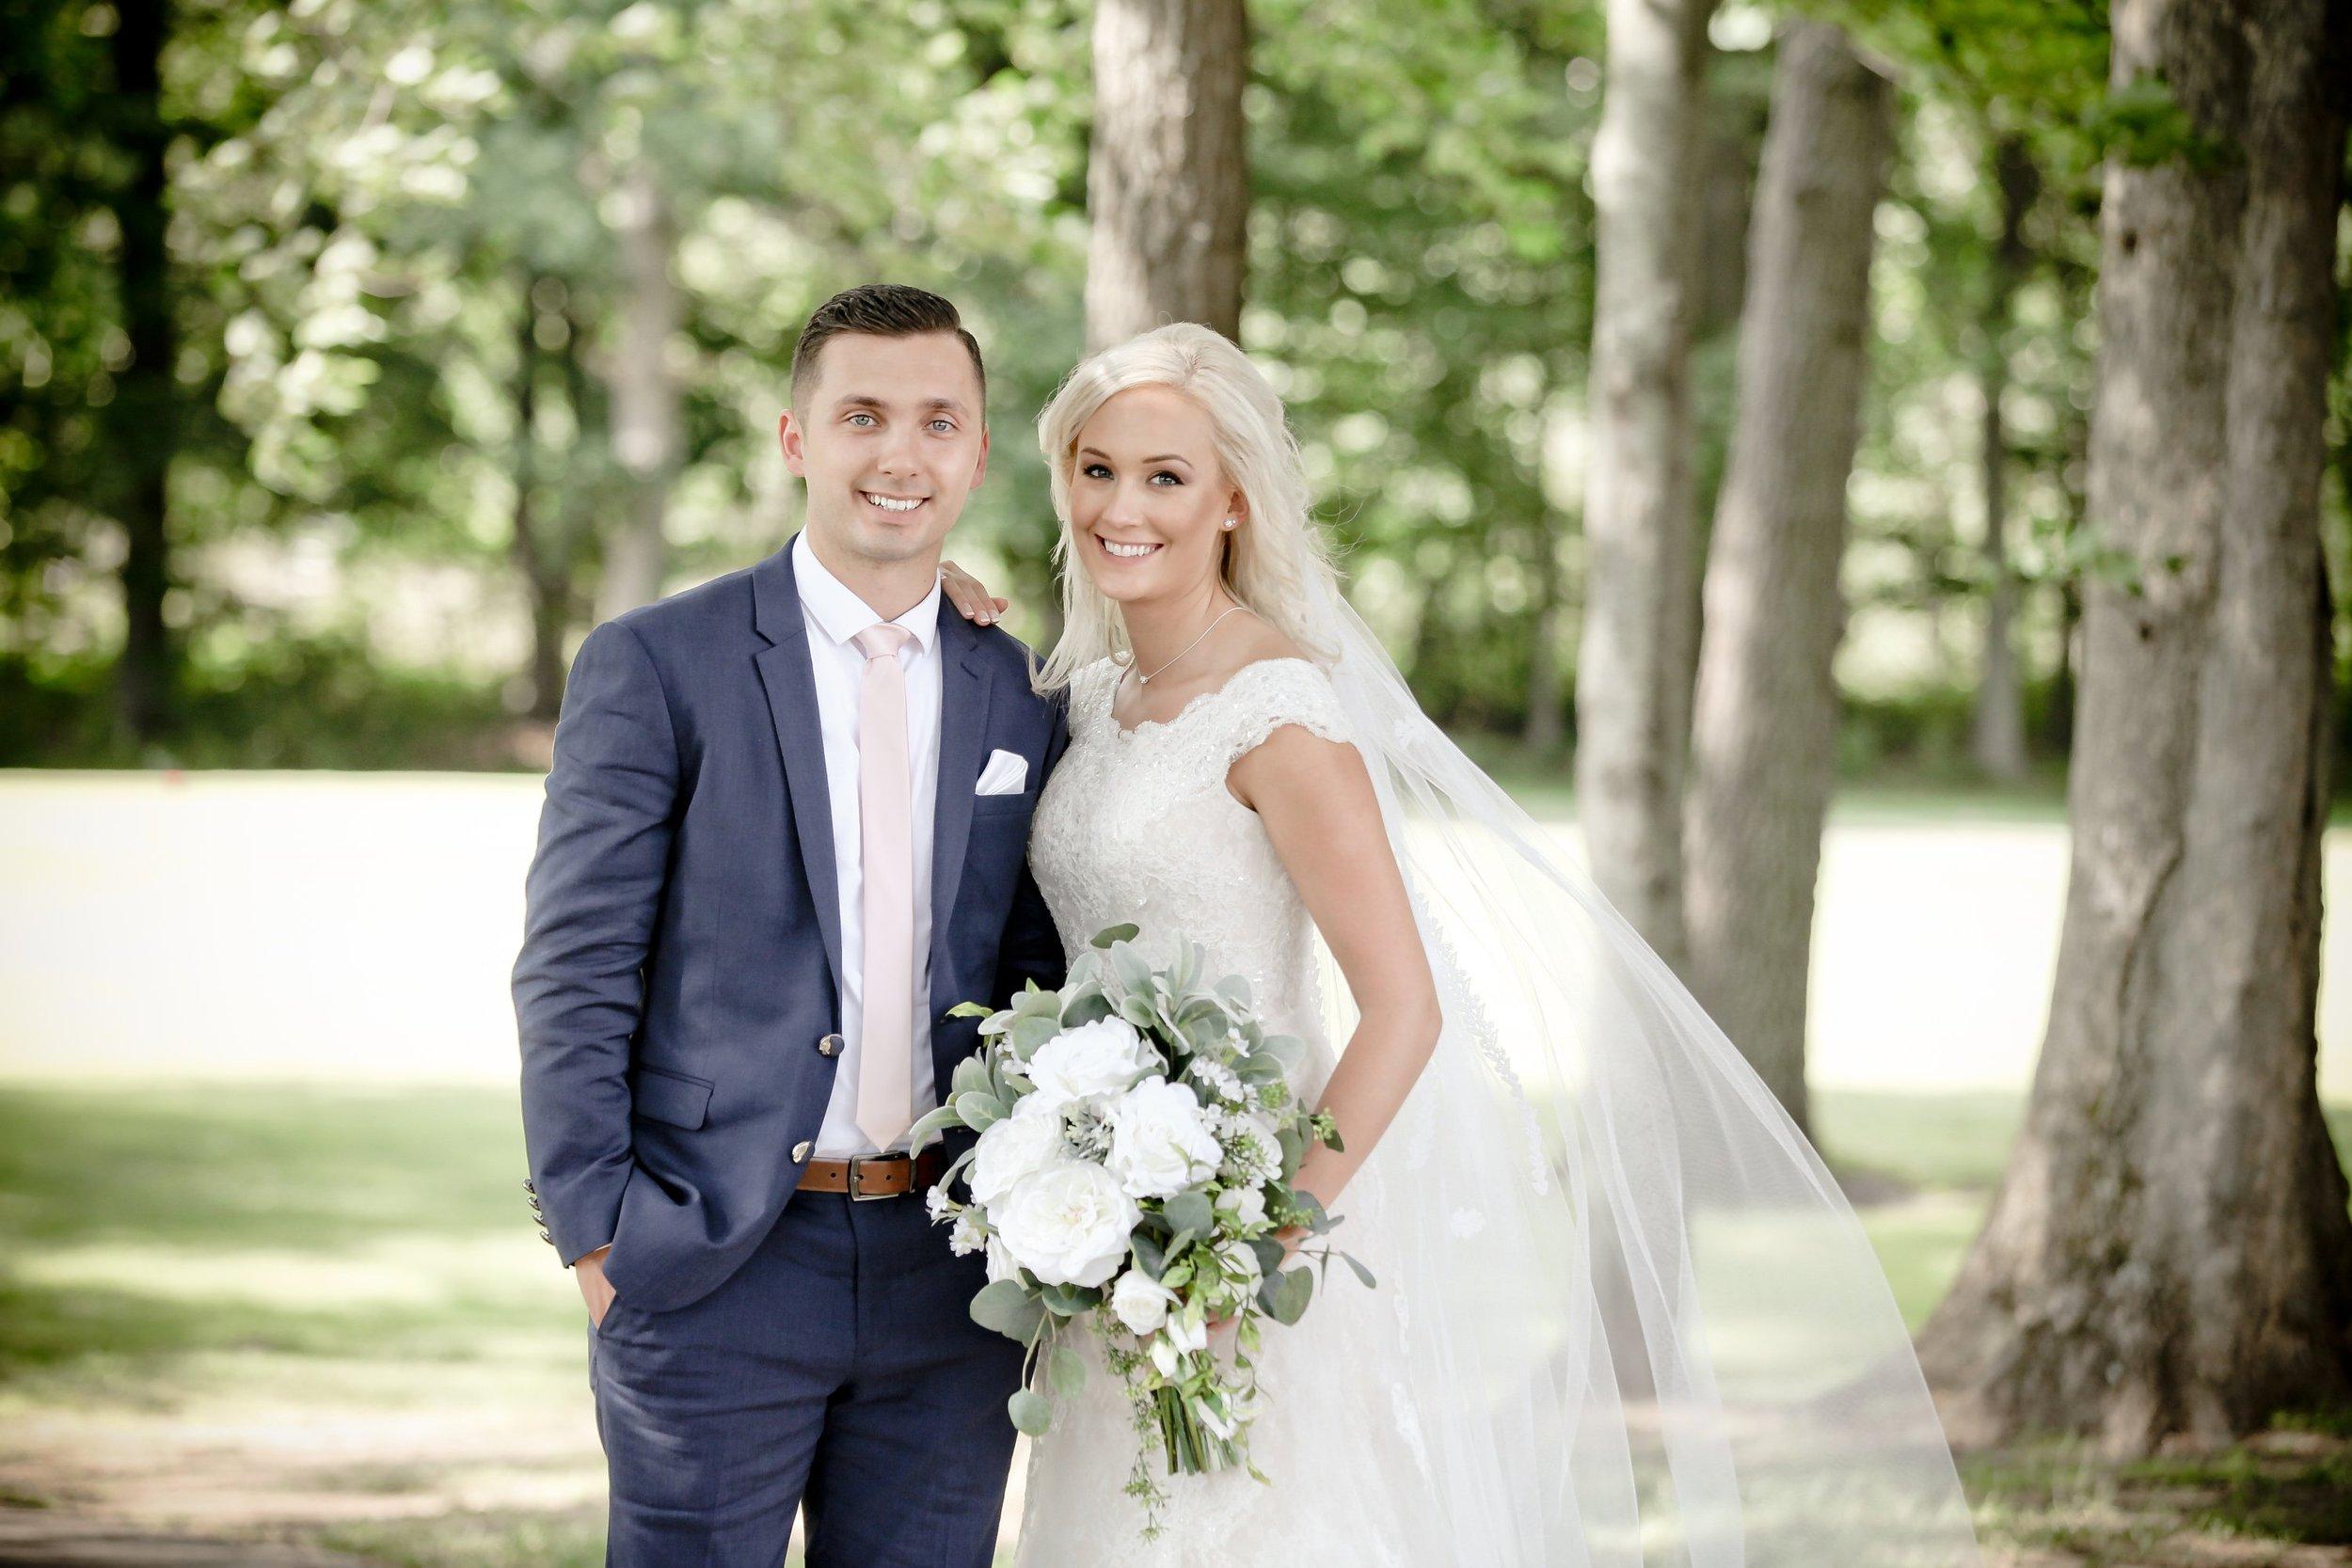 wedding bouquet, wedding flowers, boho bouquet, bridal bouquet, white, green, ivory, eucalyptus, wedding flower set, destination wedding.jpg